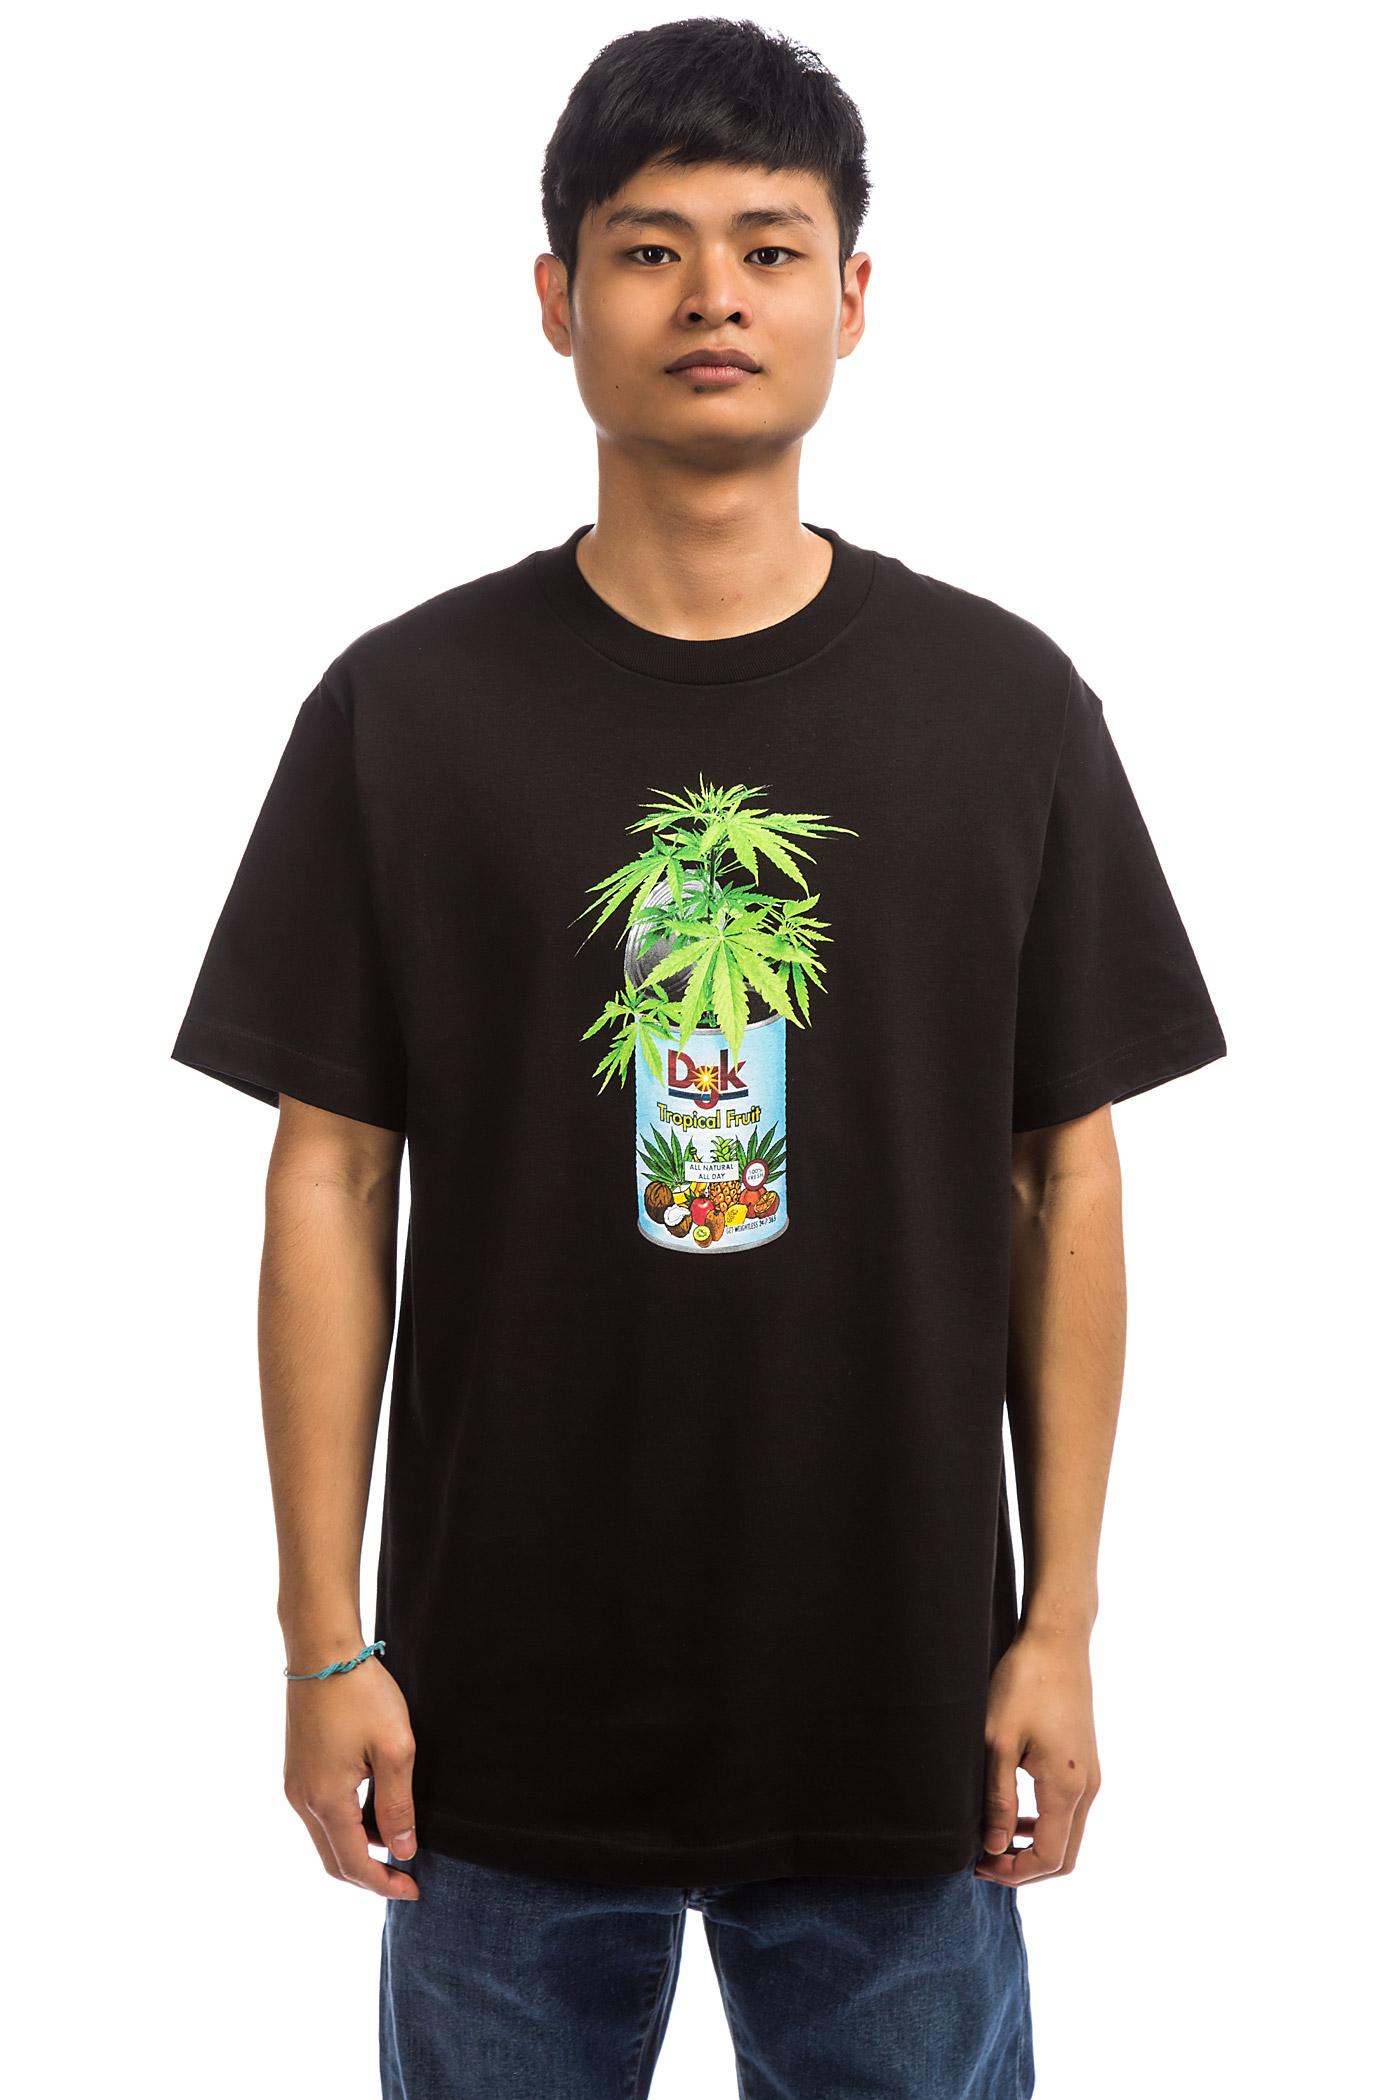 Skateboards Dgk Tropical shirtblack Fruit T trhQxdCs